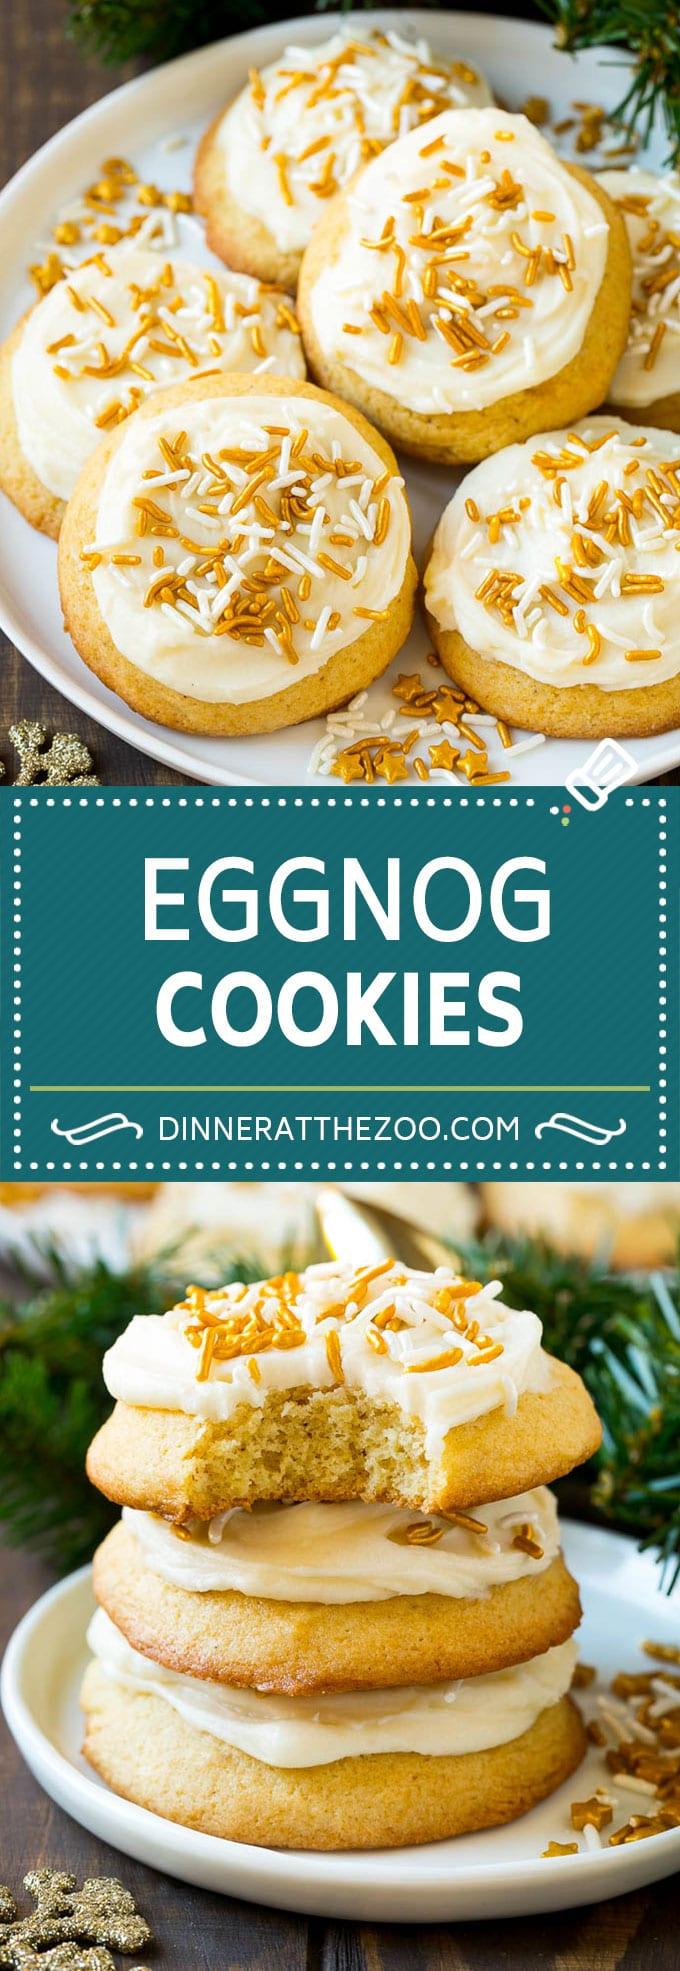 Eggnog Cookies Recipe | Holiday Cookies | Christmas Cookies #cookies #eggnog #baking #christmas #sprinkles #dessert #dinneratthezoo